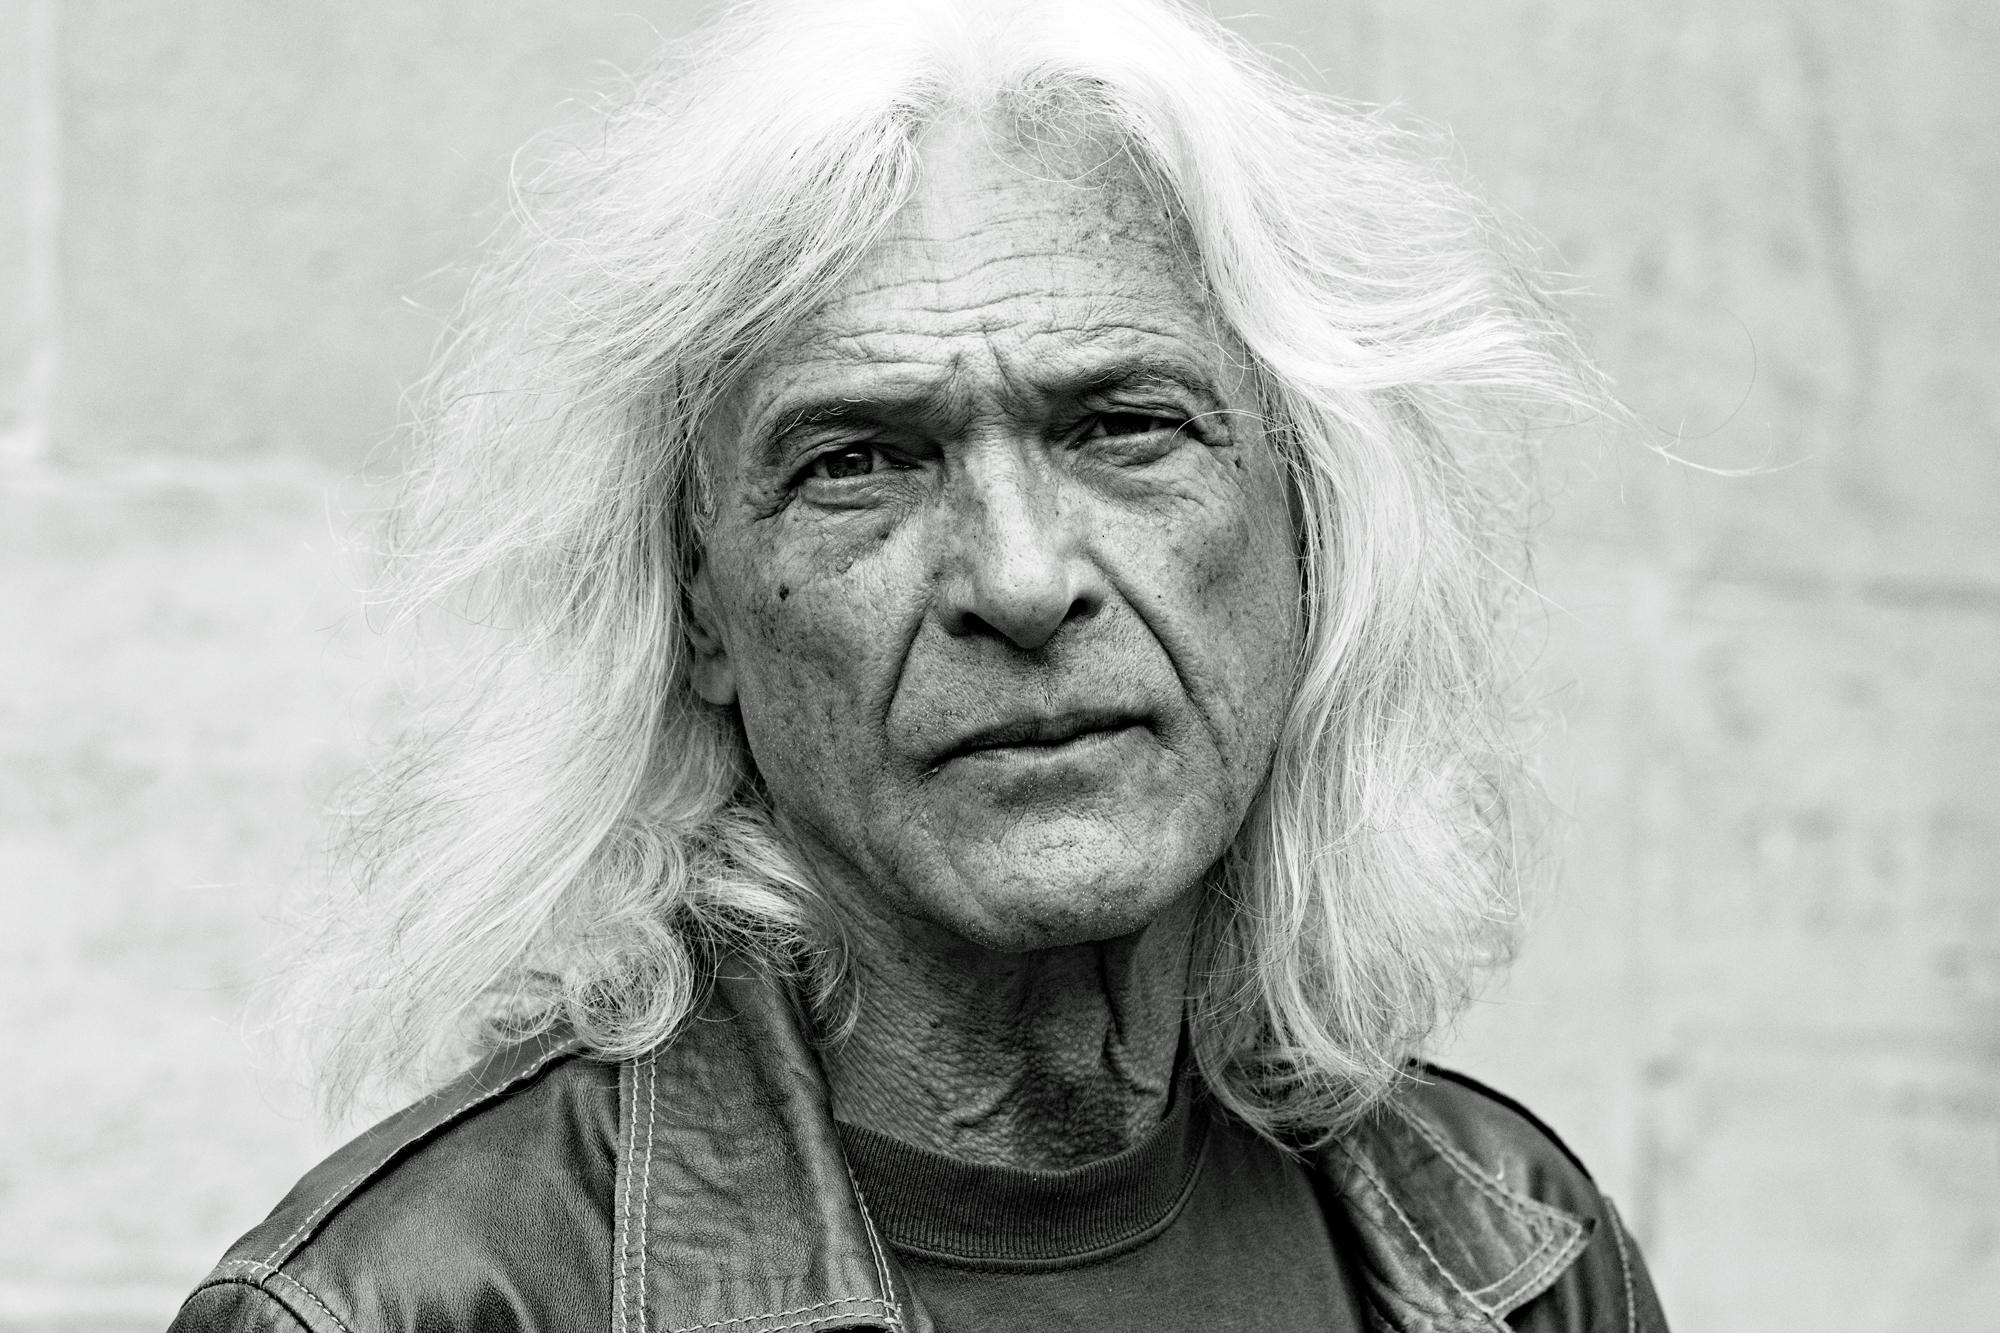 Tom Jauer (Foto: © 2018 Wolfgang Weßling)